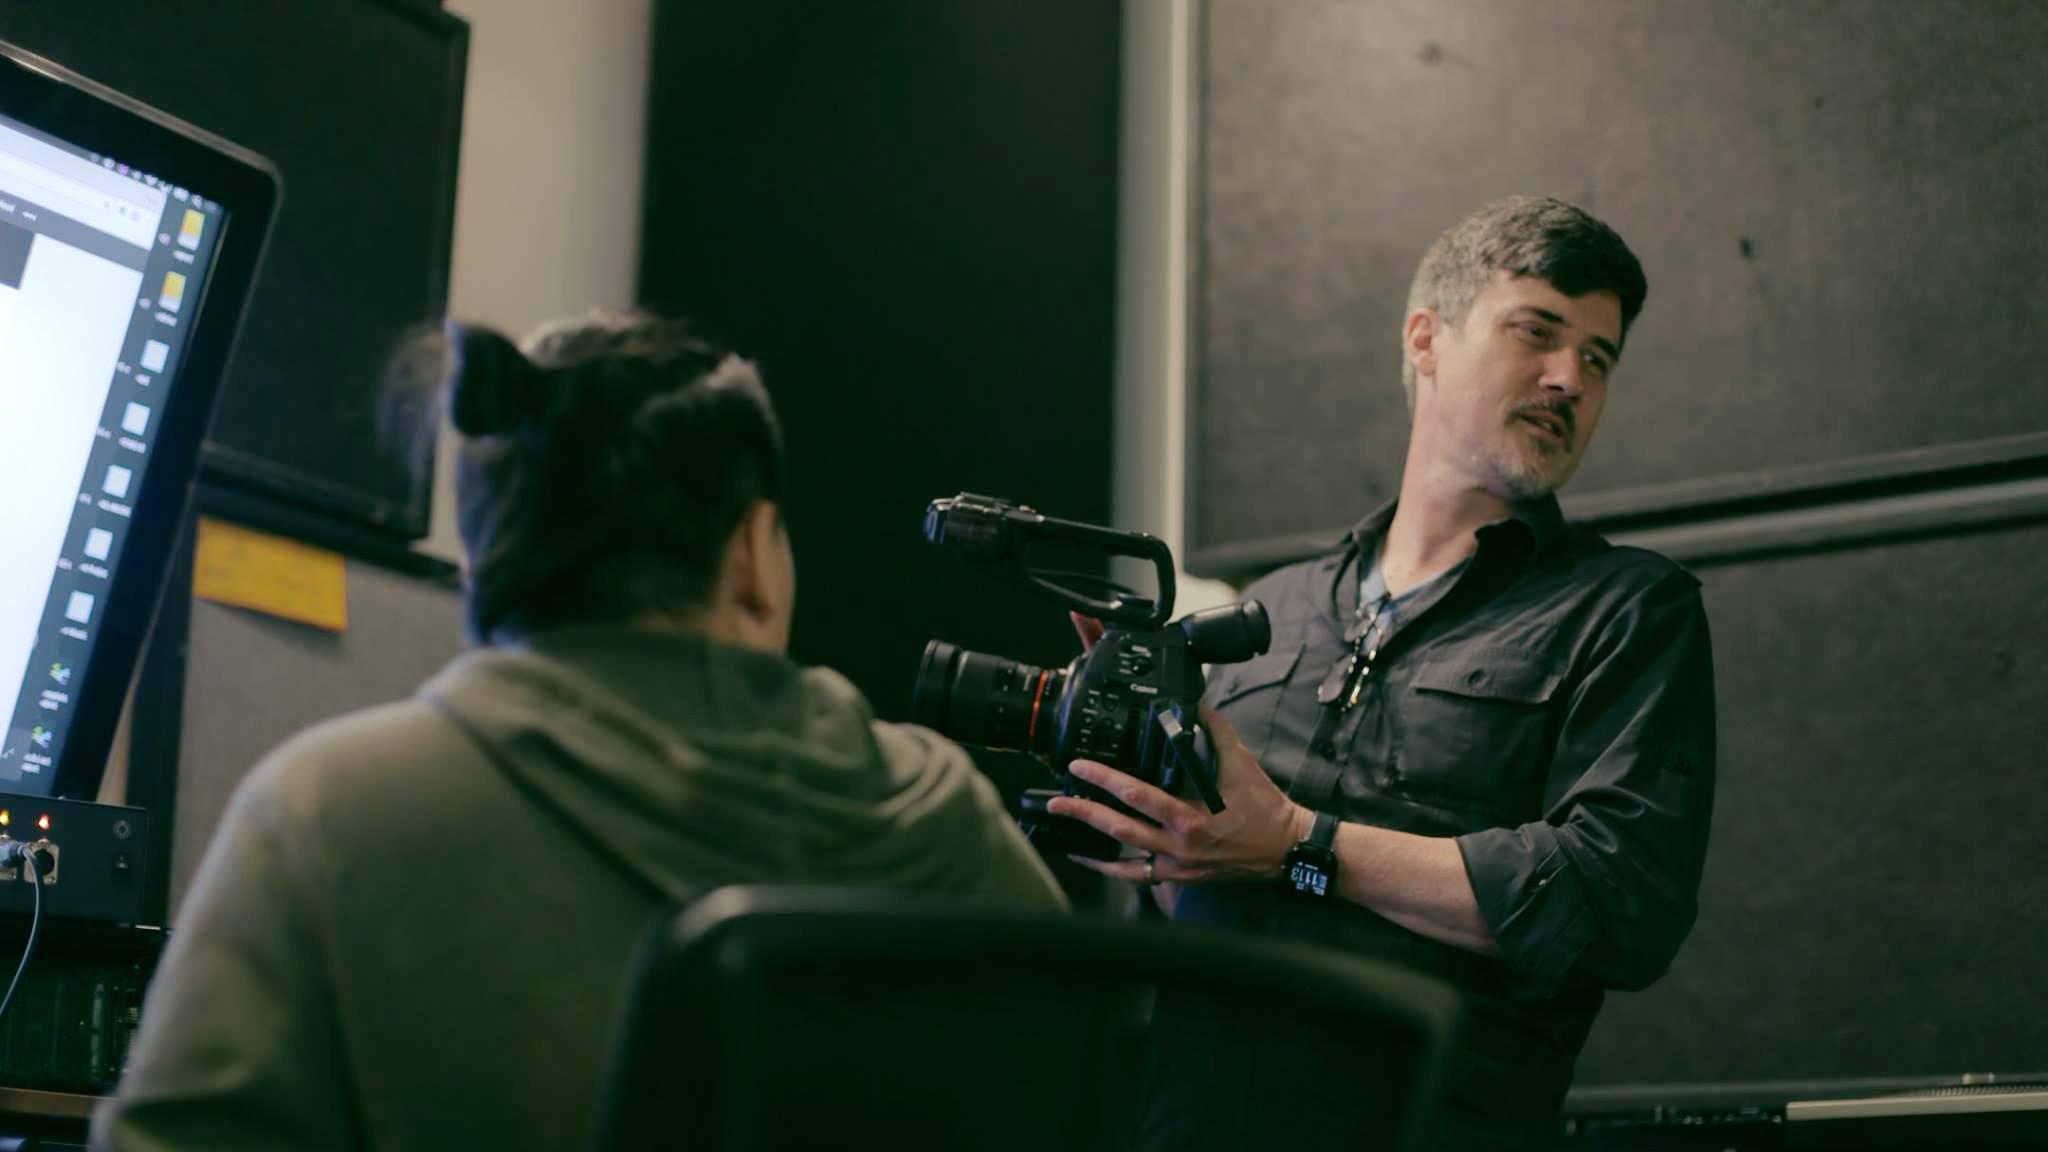 Frank Dellario-On set.jpg